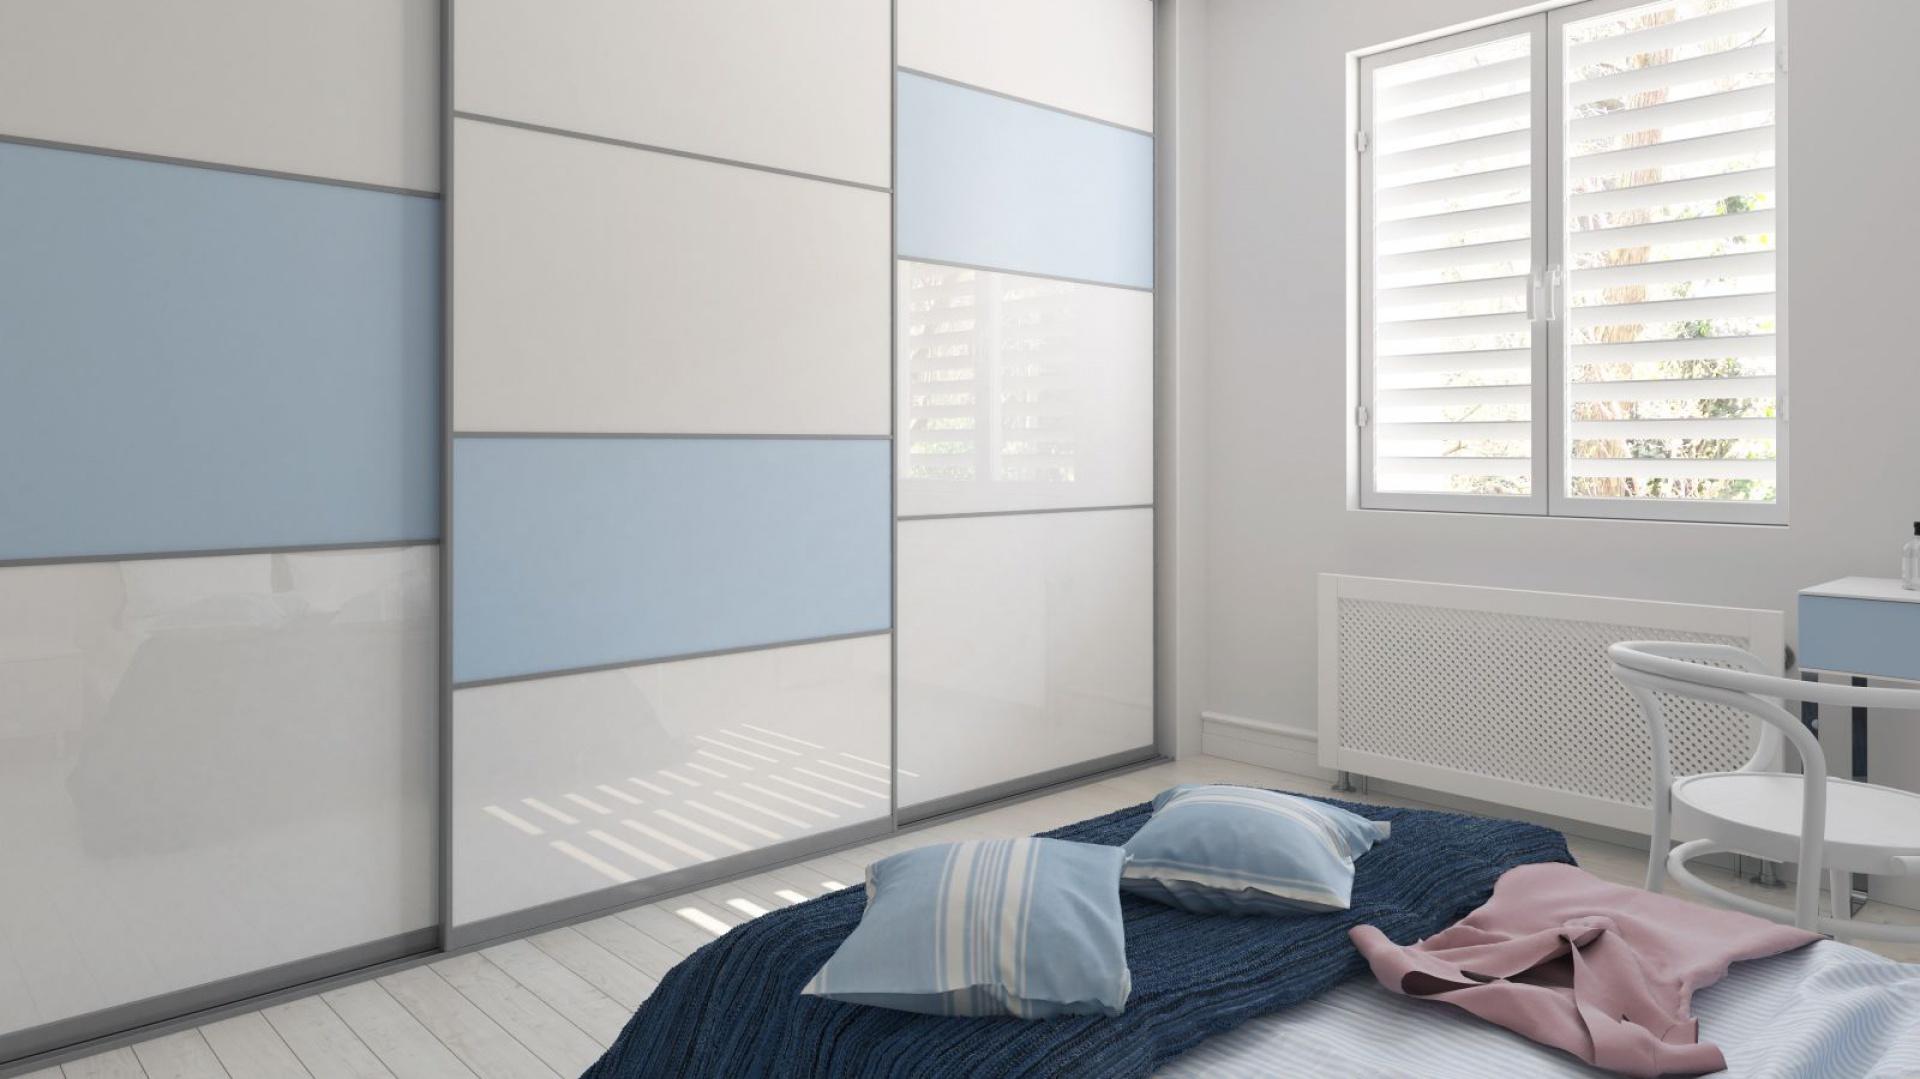 Szkło lakierowane Colorimo Sati. Fot. Mochnik